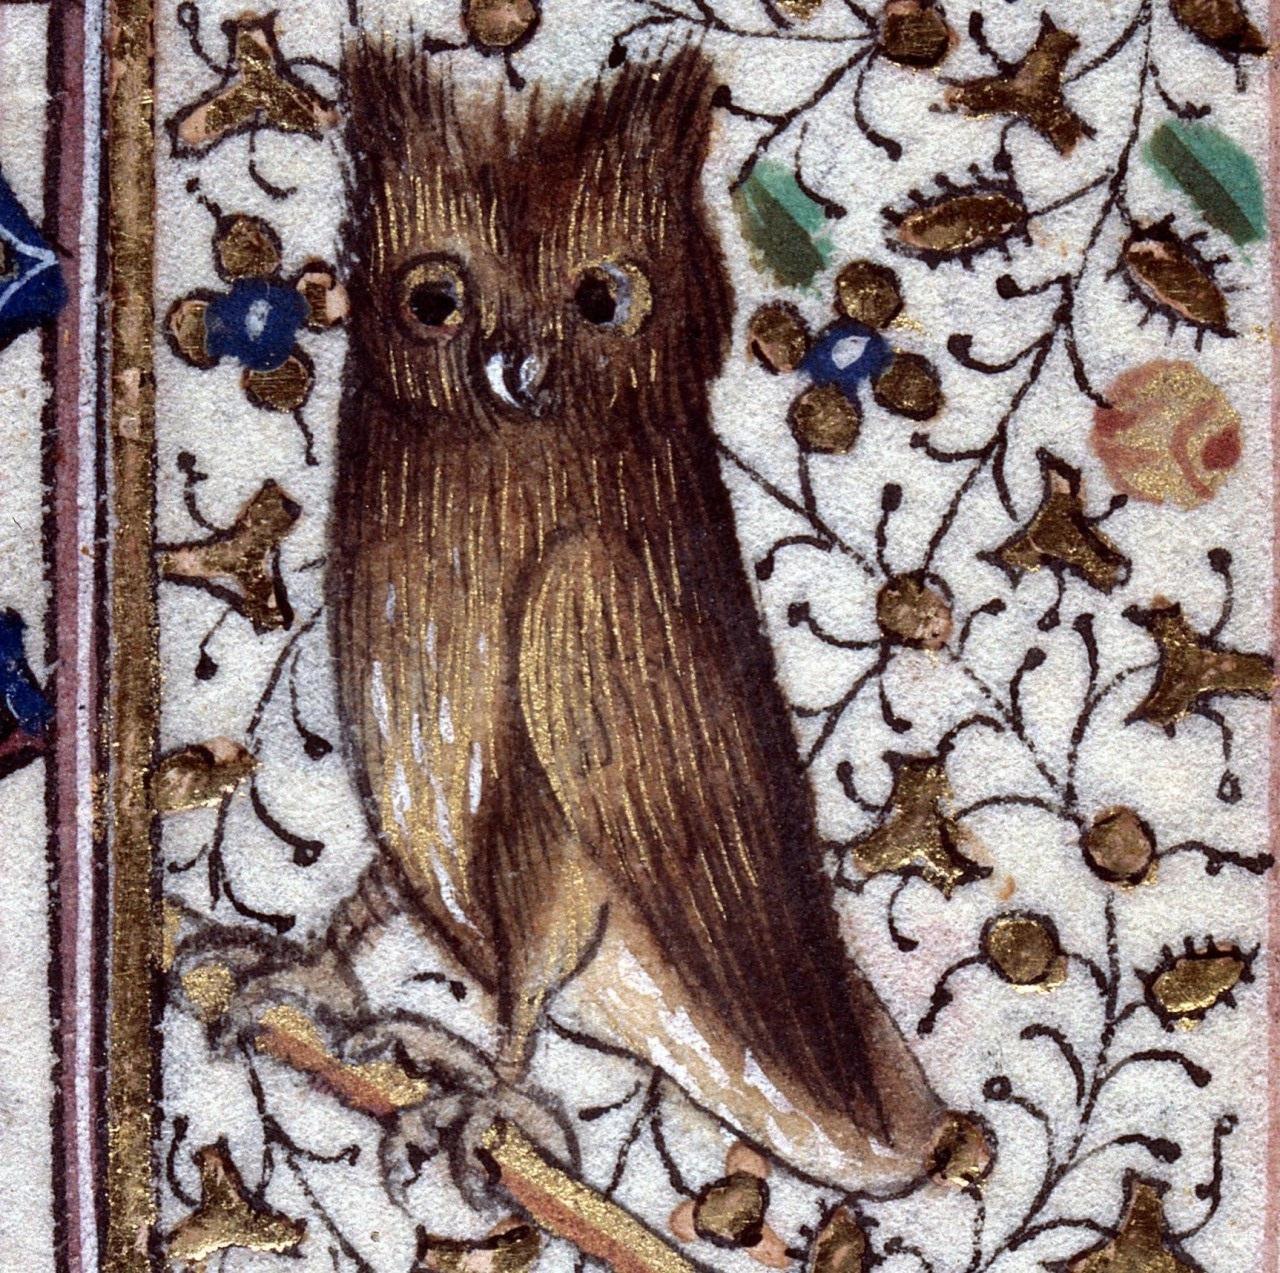 eagle-owl-book-of-hours-savoie-15th-cenutury